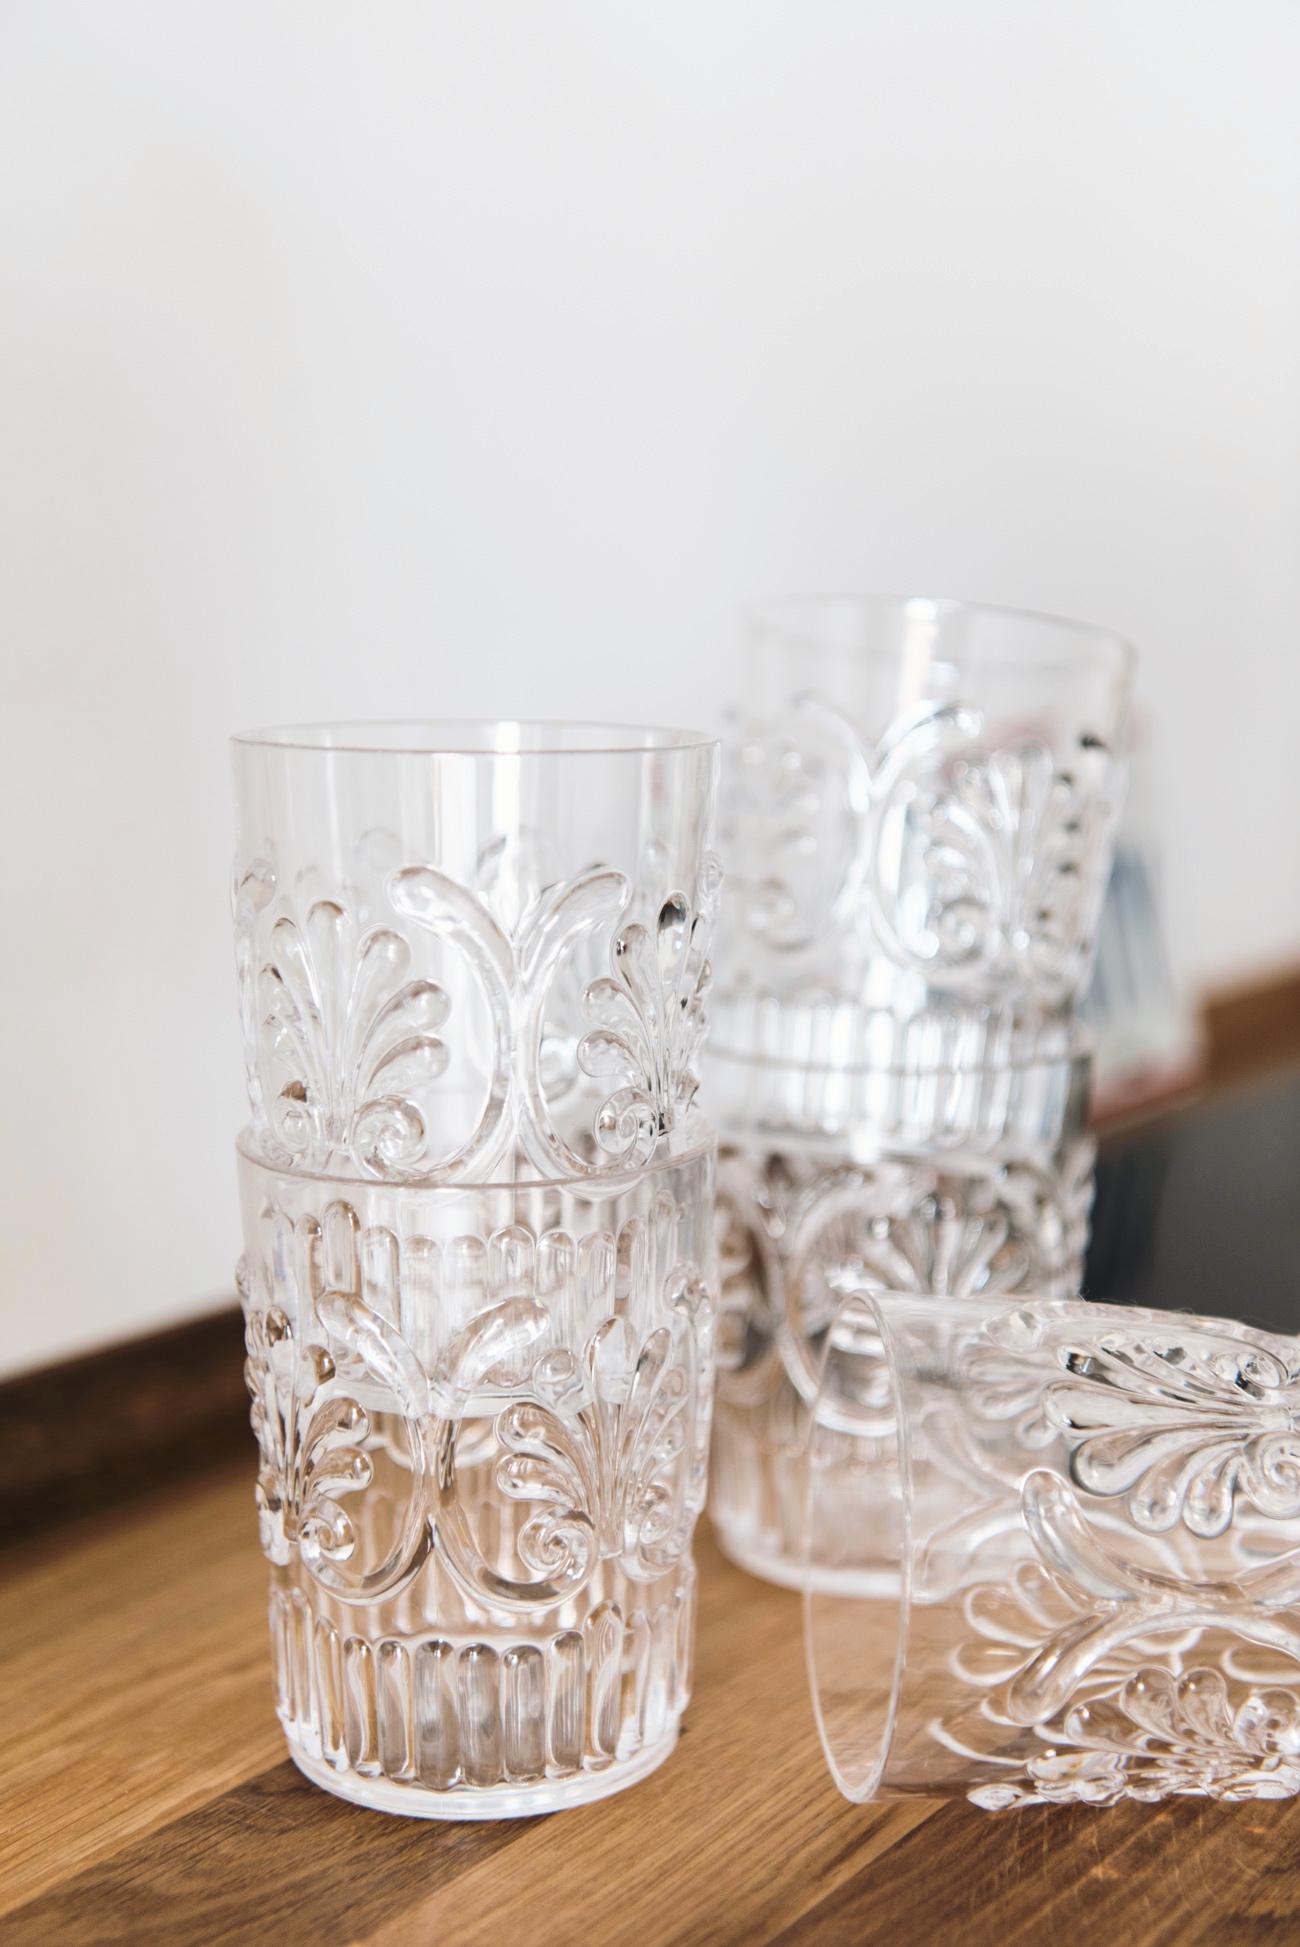 kristall-gläser-design-fashiioncarpet